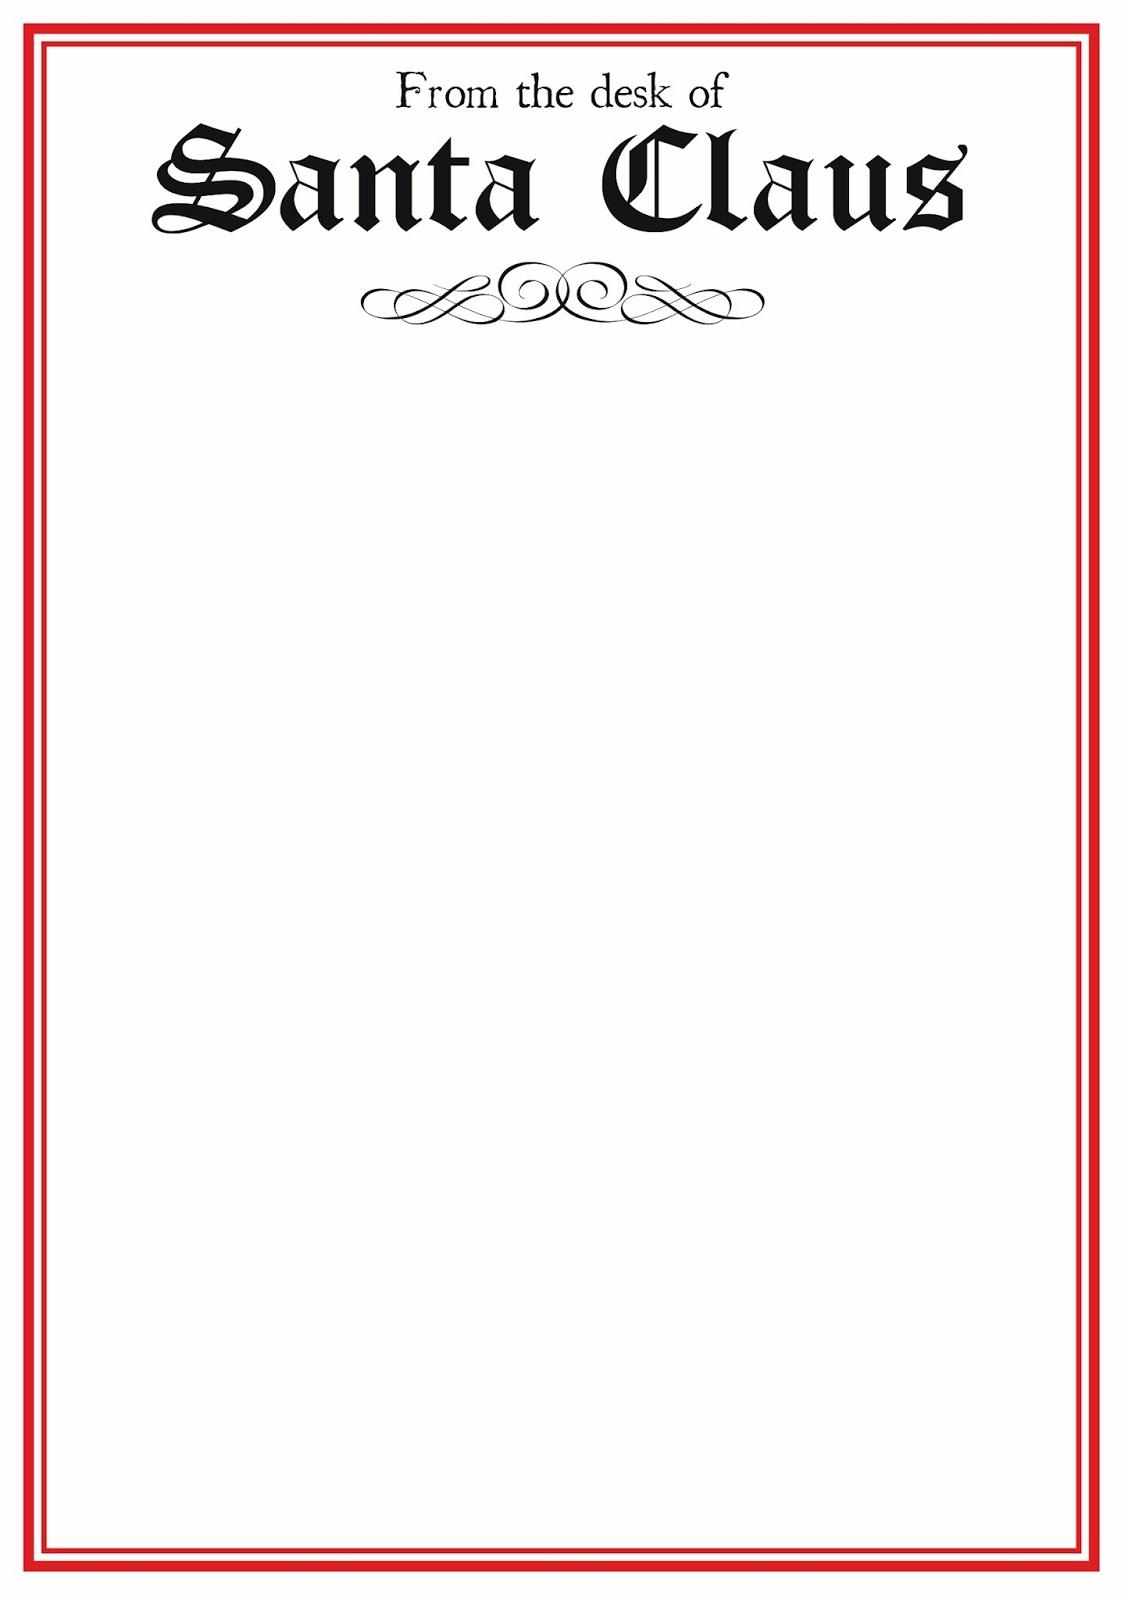 Santa Claus Letter Template - Word Santa Letter Template Acurnamedia